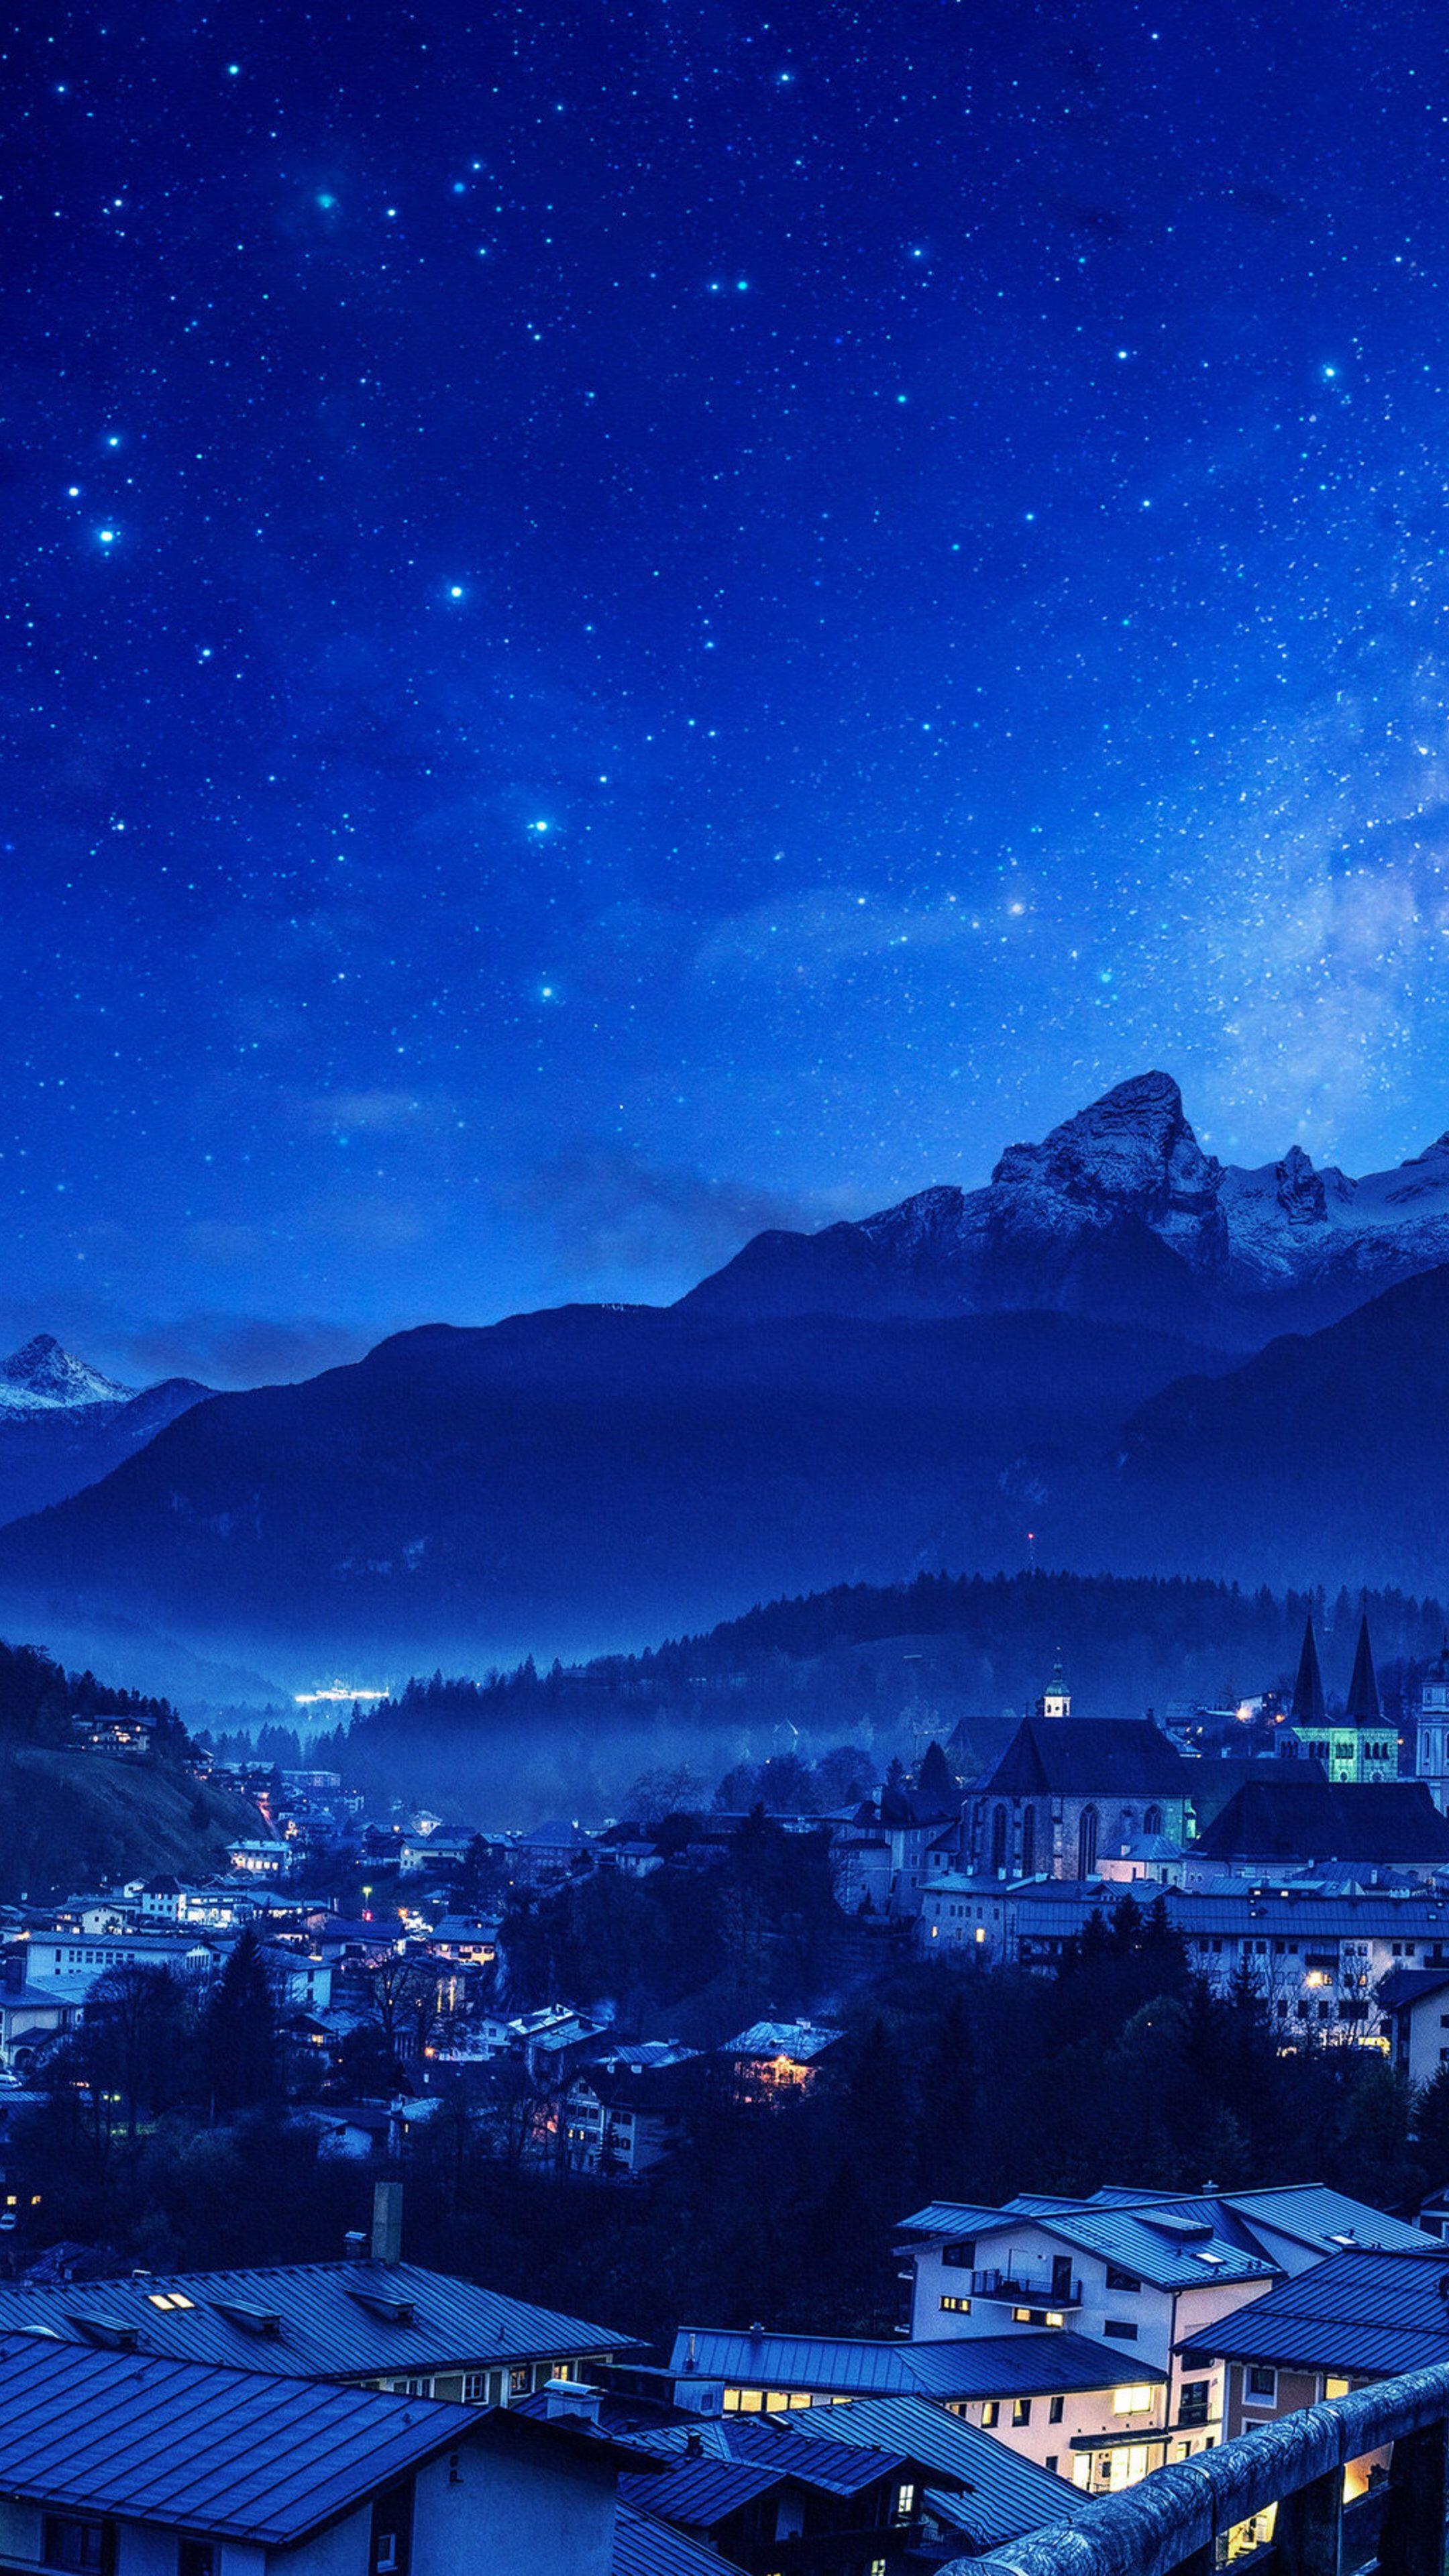 Landscape wallpaper, Anime backgrounds ...